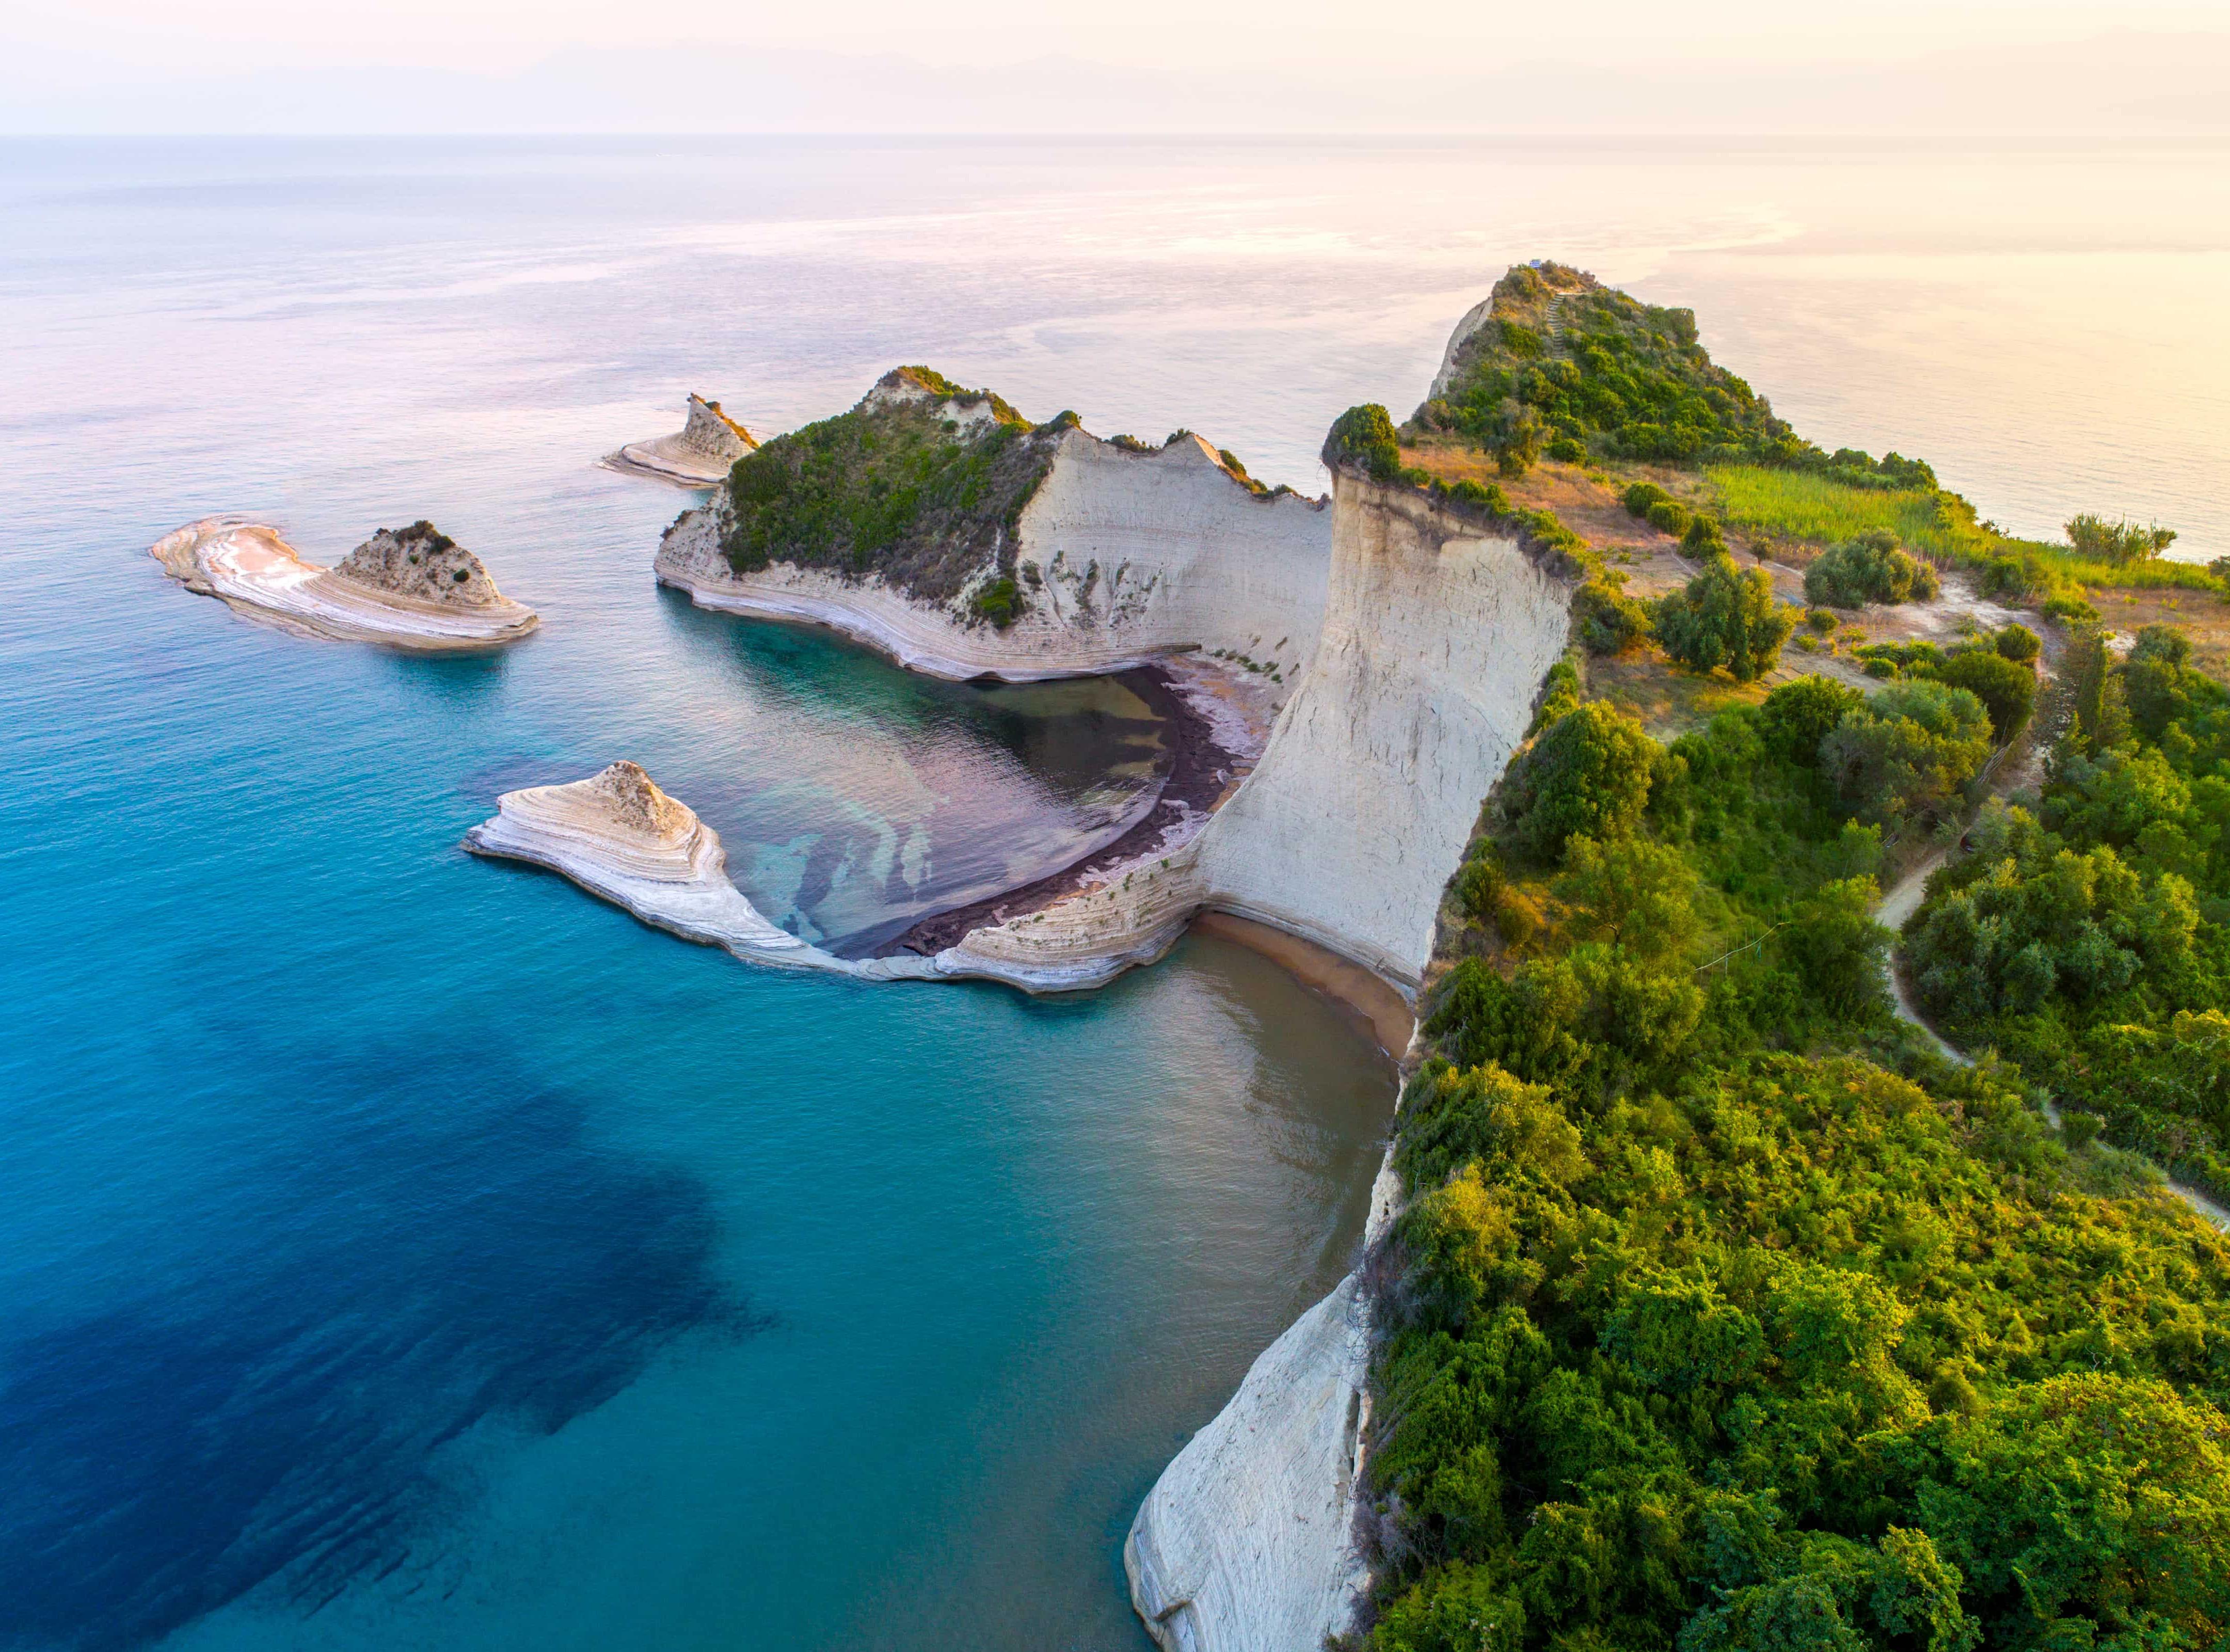 rodos-korfu-iraklion-skyup-rozpochinaye-velike-grecke-lito